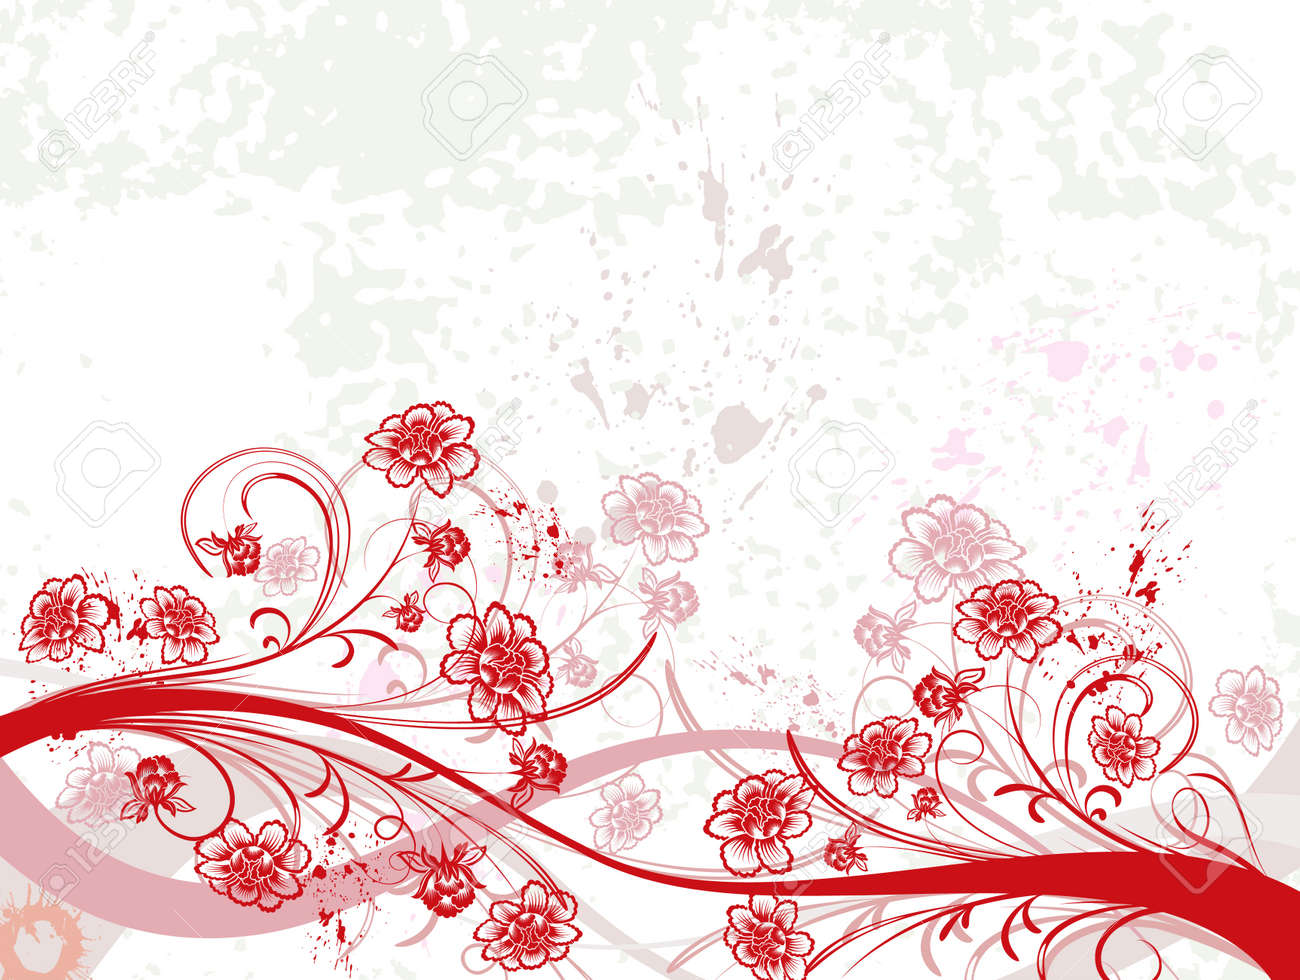 Grunge paint floral chaos, element for design, vector illustration Stock Illustration - 873485